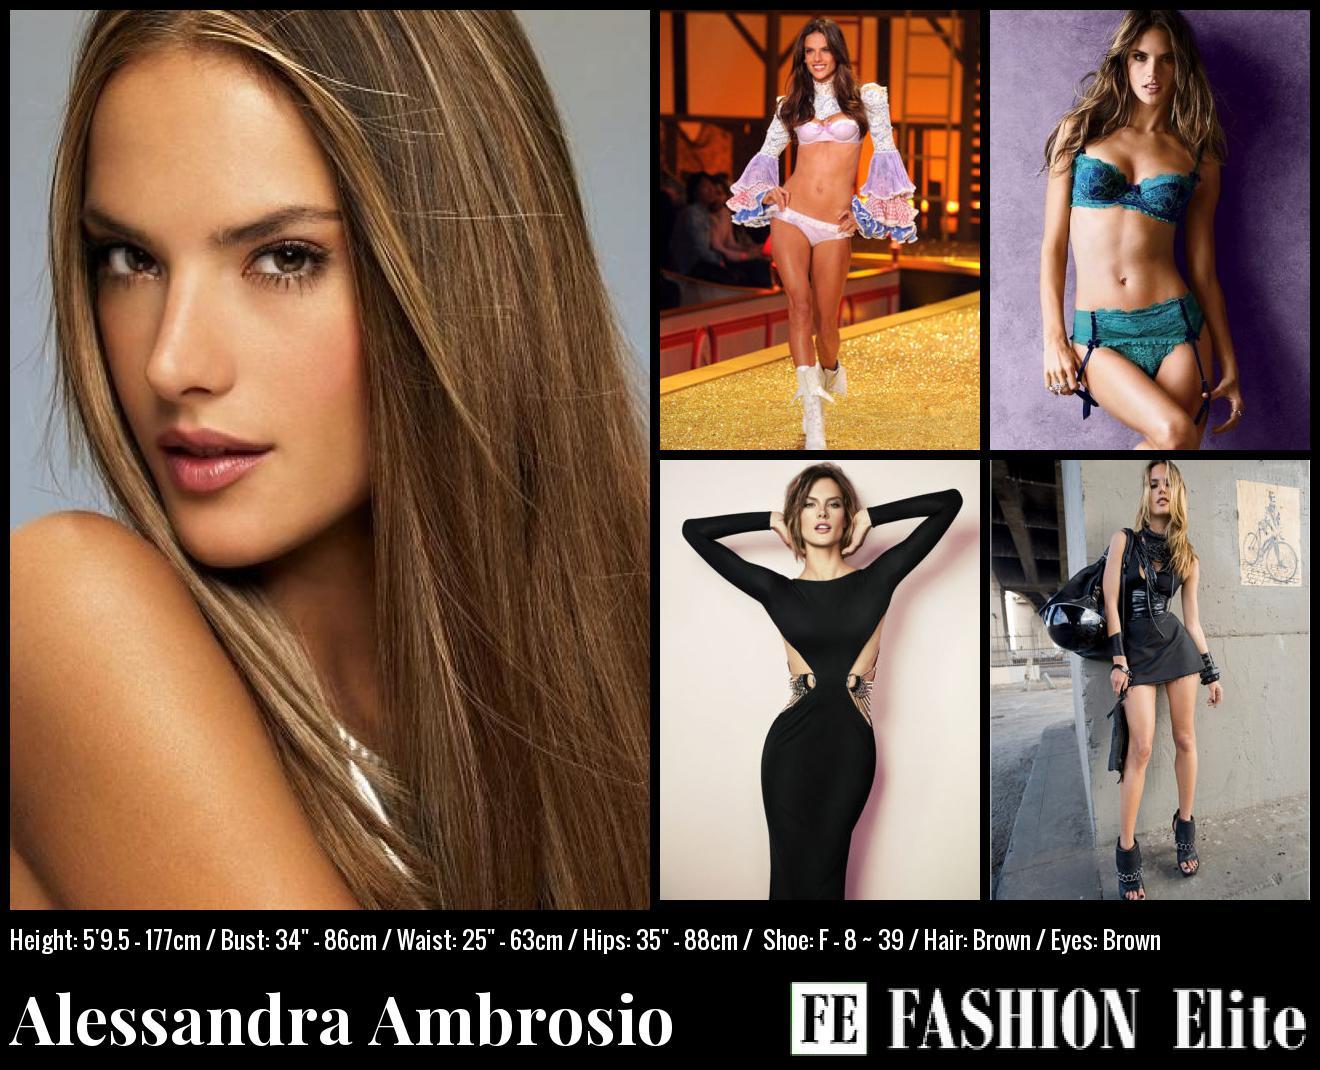 Alessandra Ambrosio Comp Card